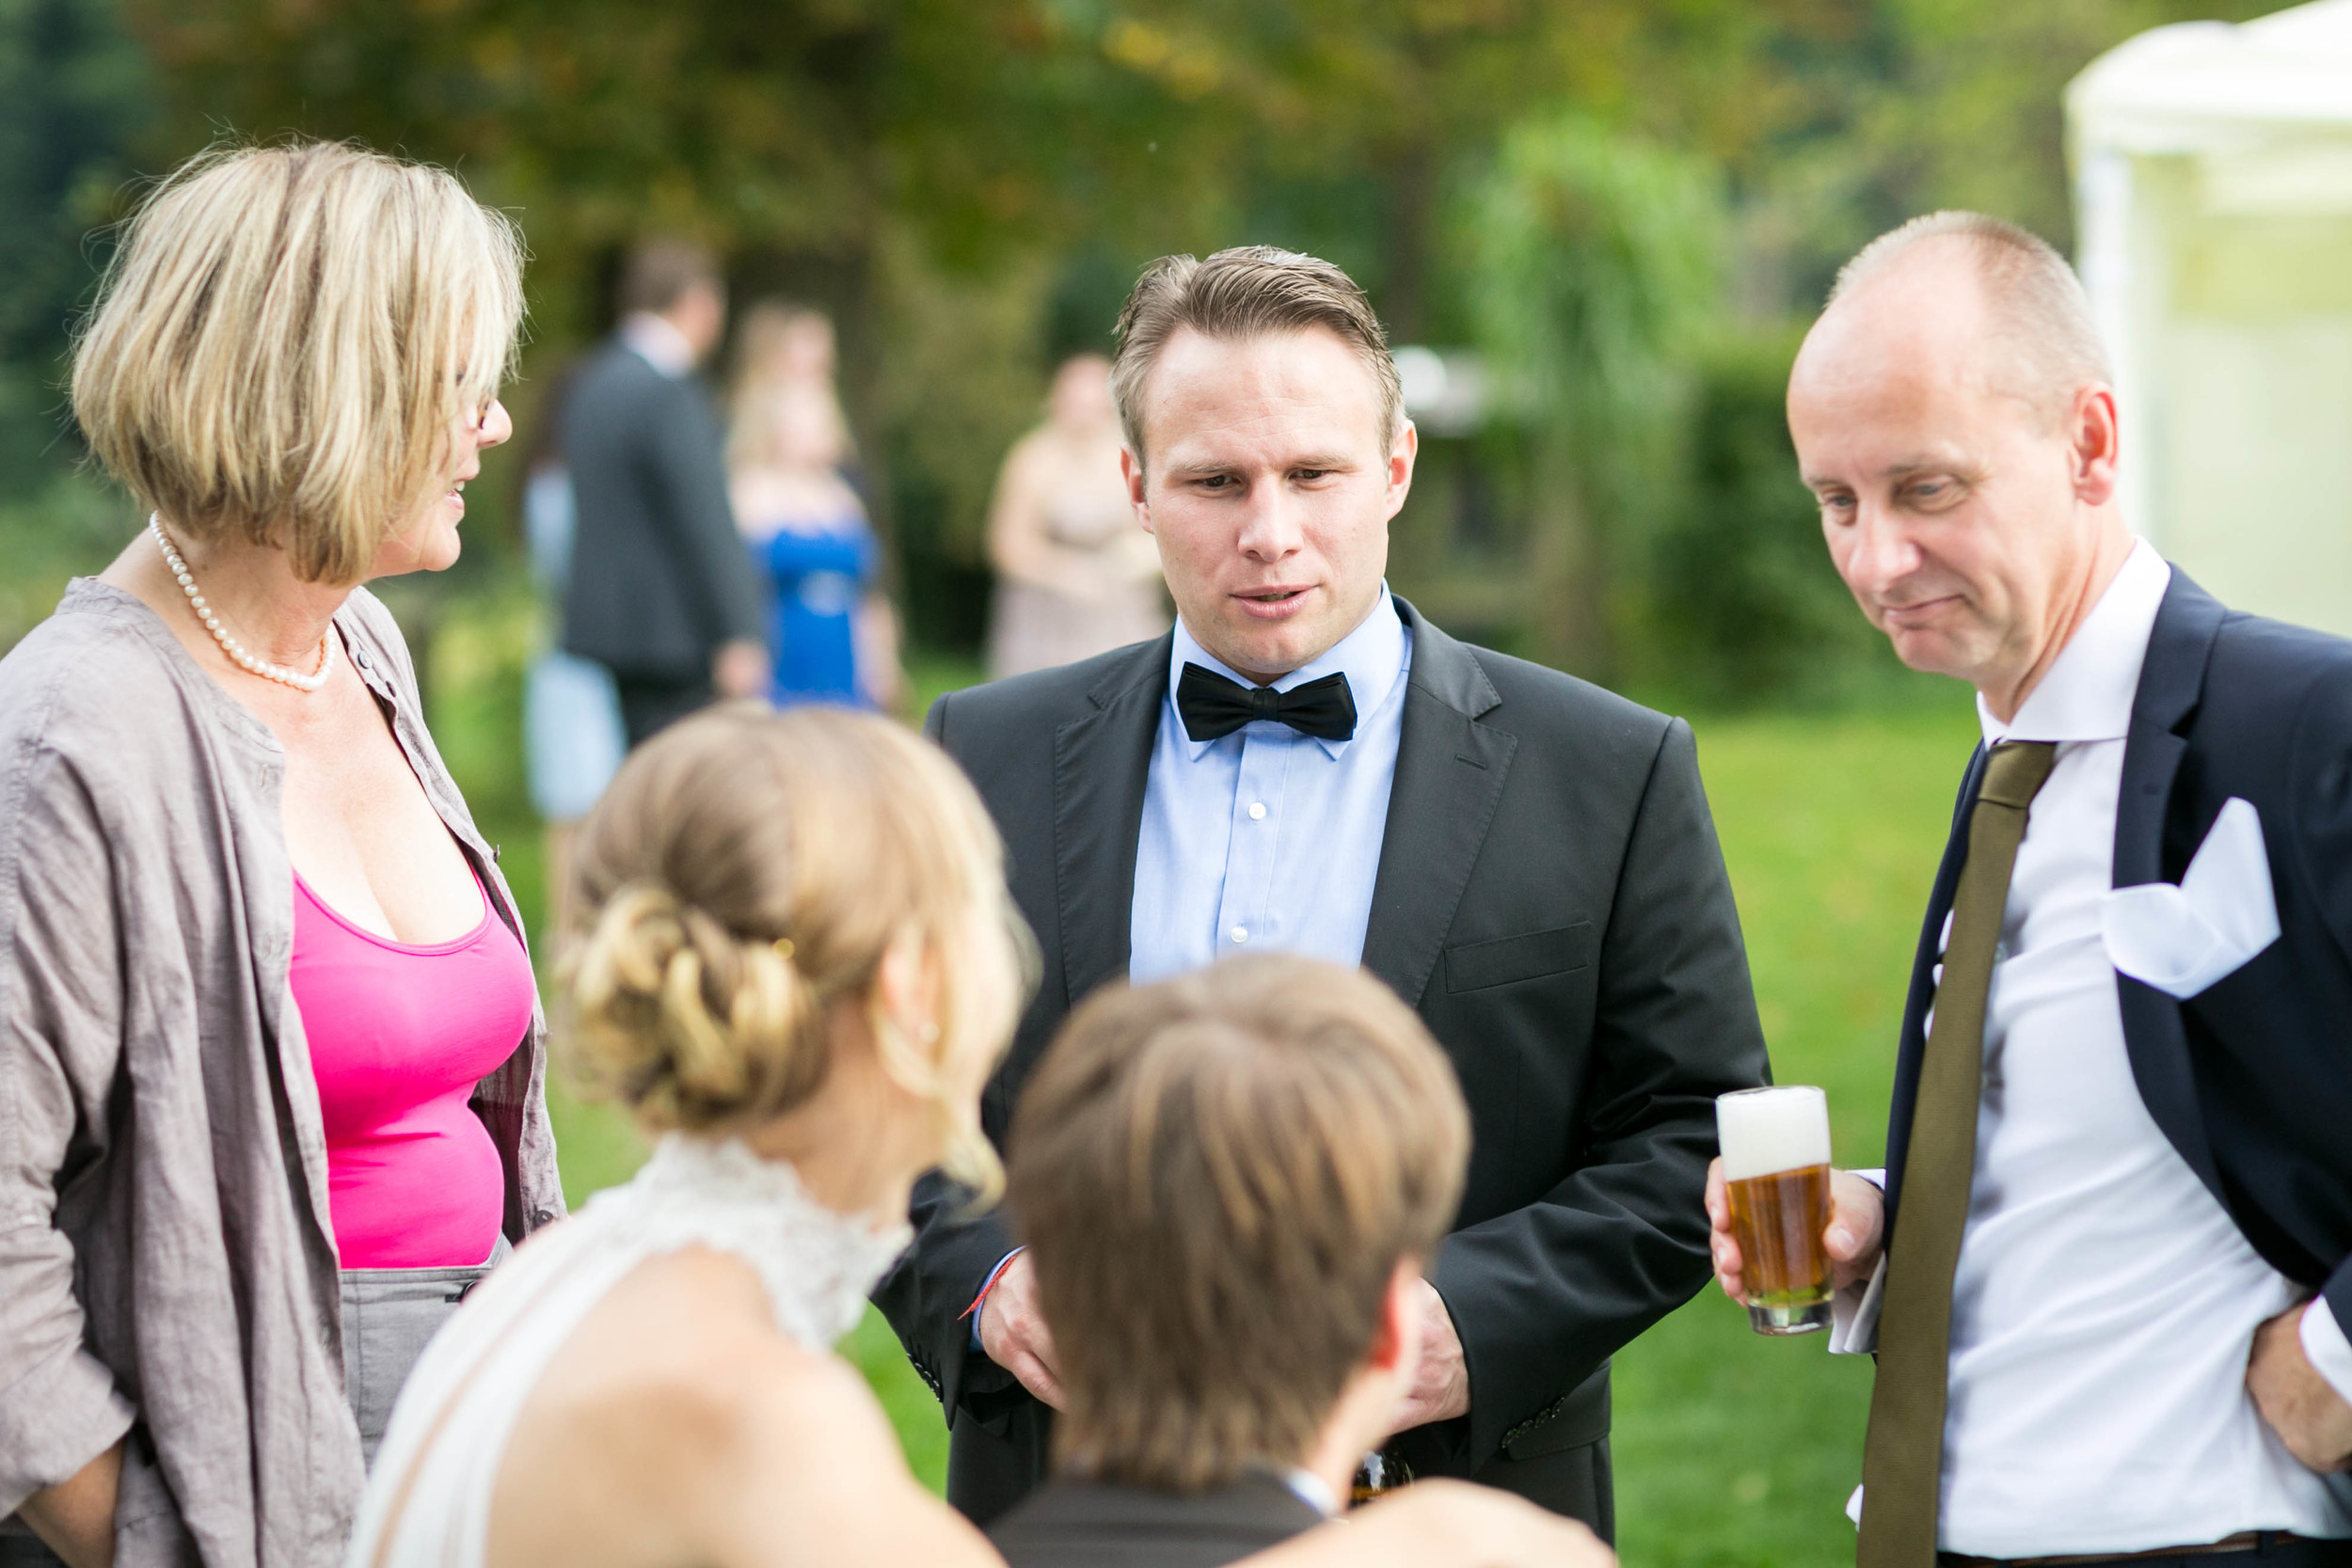 Fran Burrows Hochzeitsfotografie_Kulturgut Wrechen Hochzeit-61.jpg